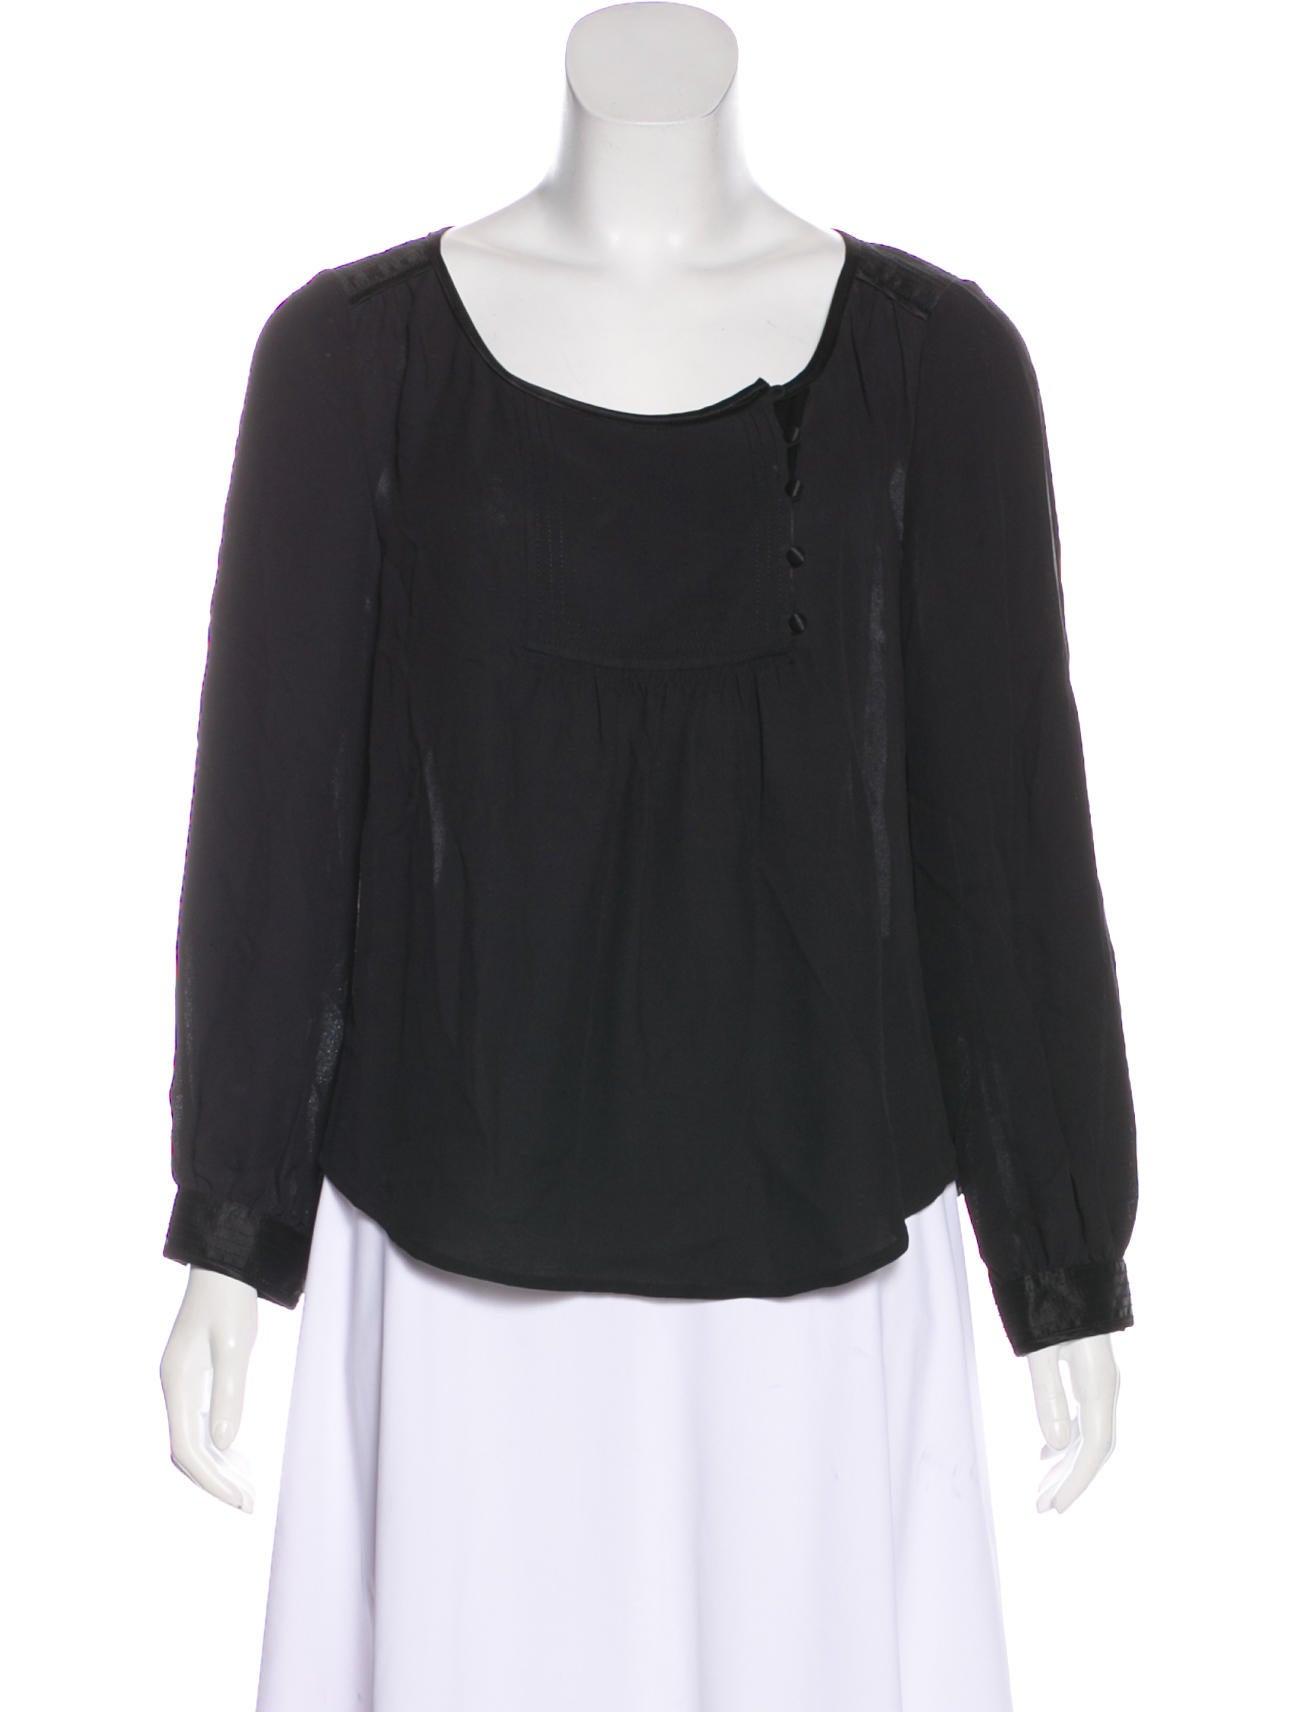 Diane Von Furstenberg Laos Silk Blouse Clothing Wdi142854 The